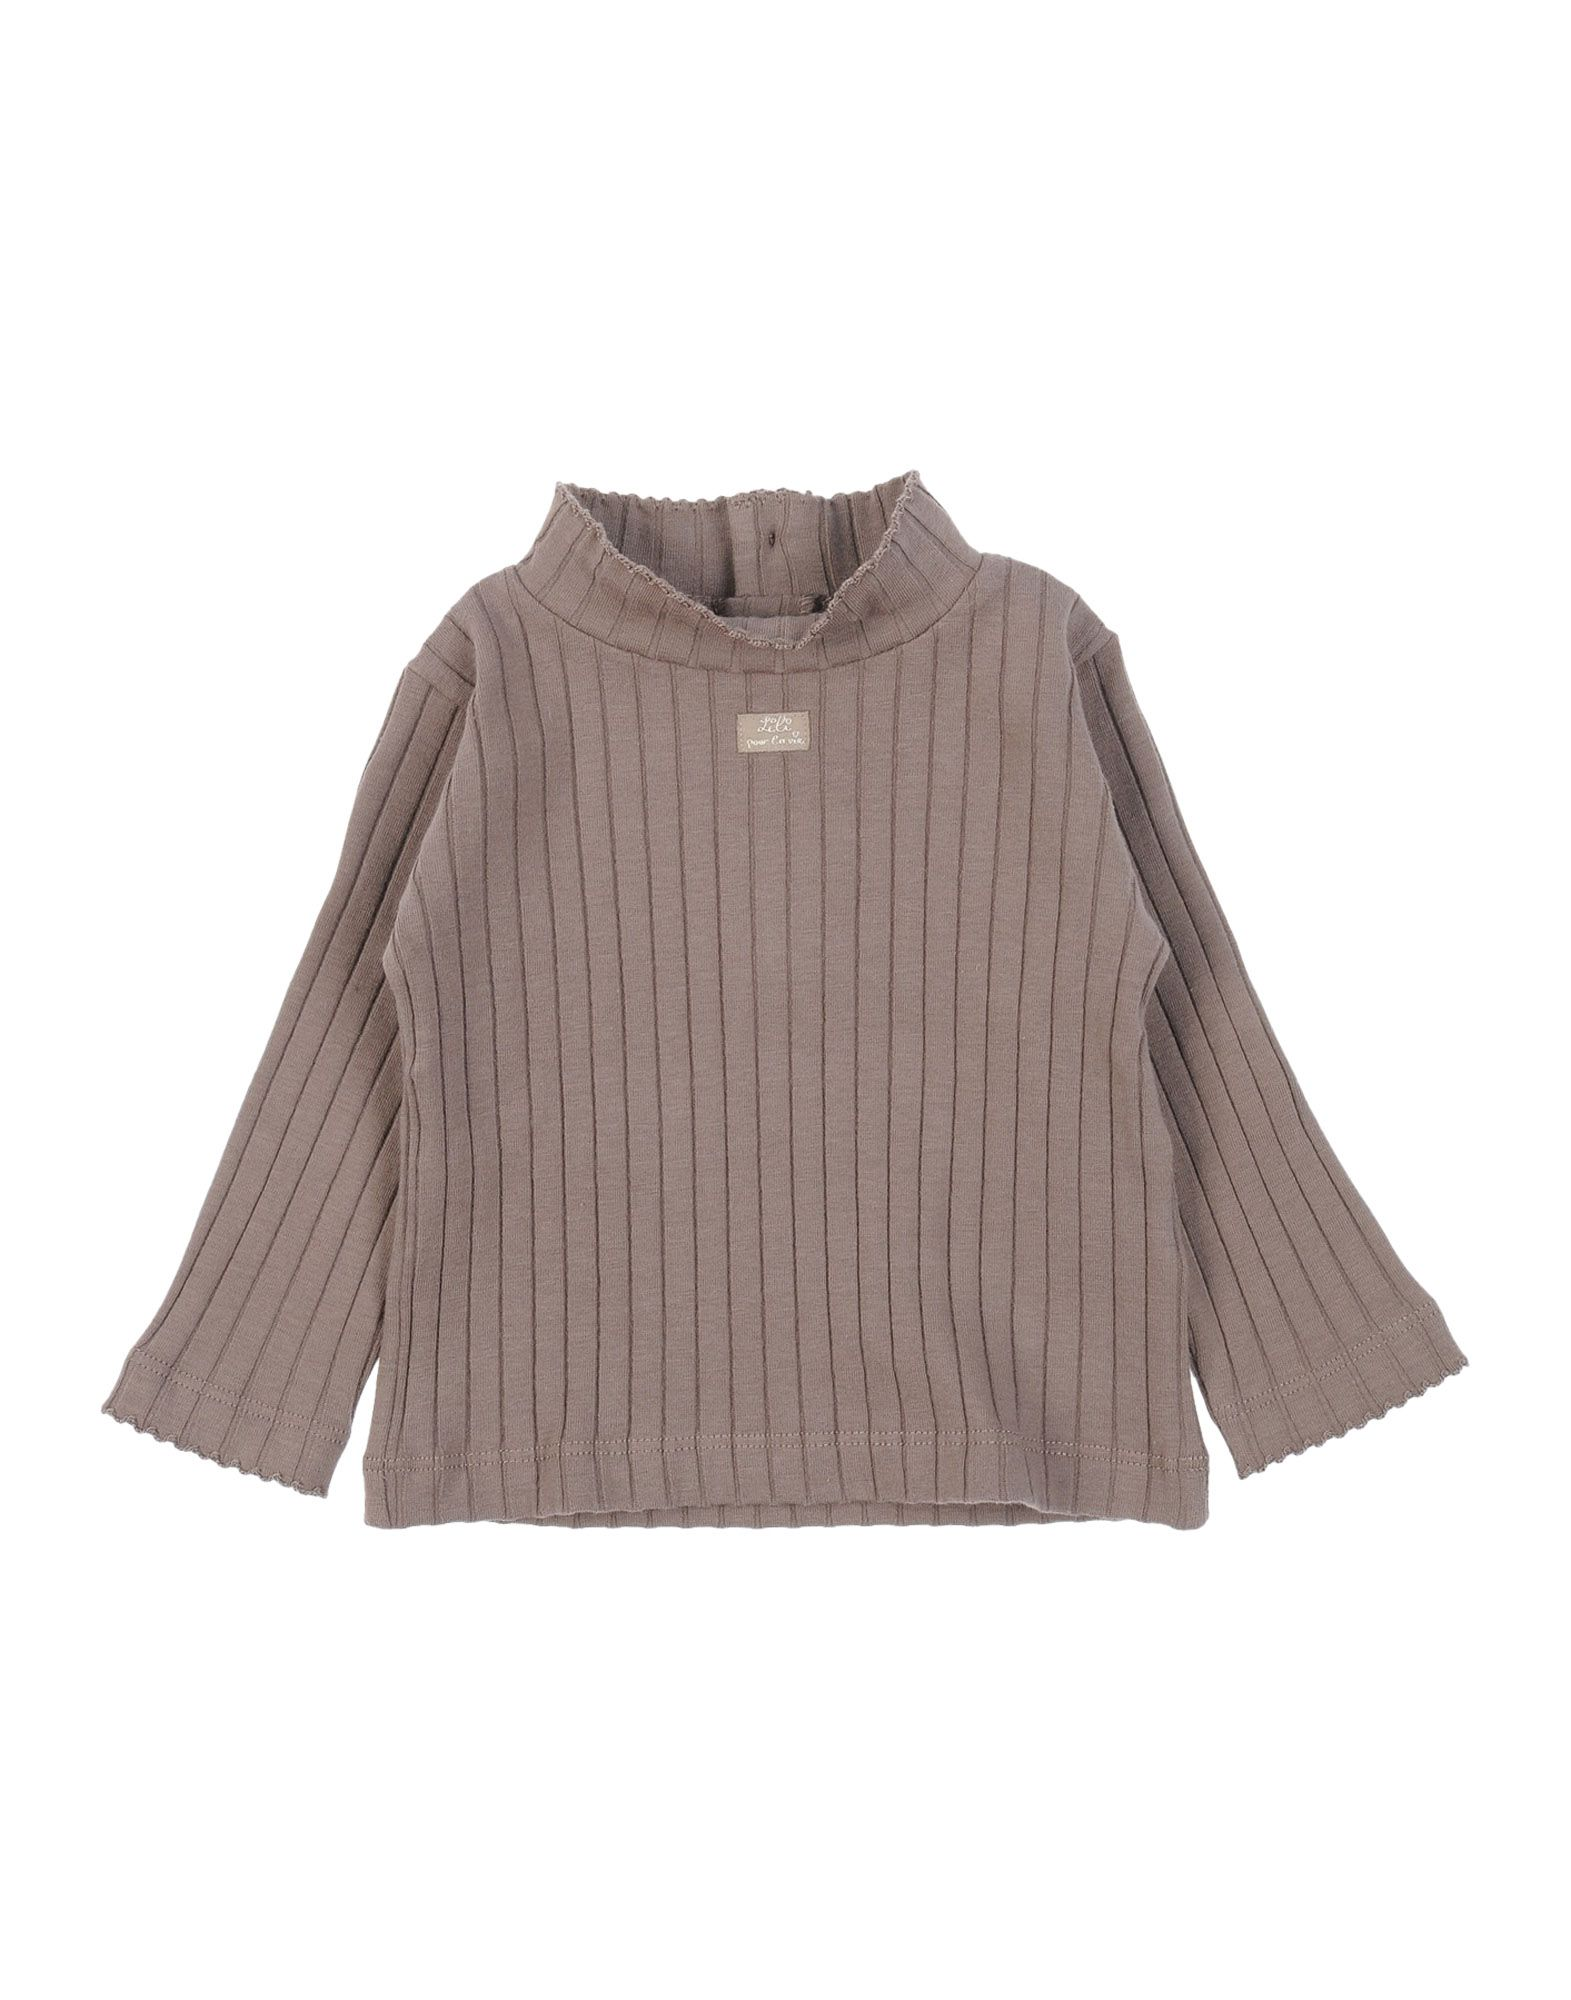 LILI GAUFRETTE Mädchen 0-24 monate T-shirts Farbe Khaki Größe 3